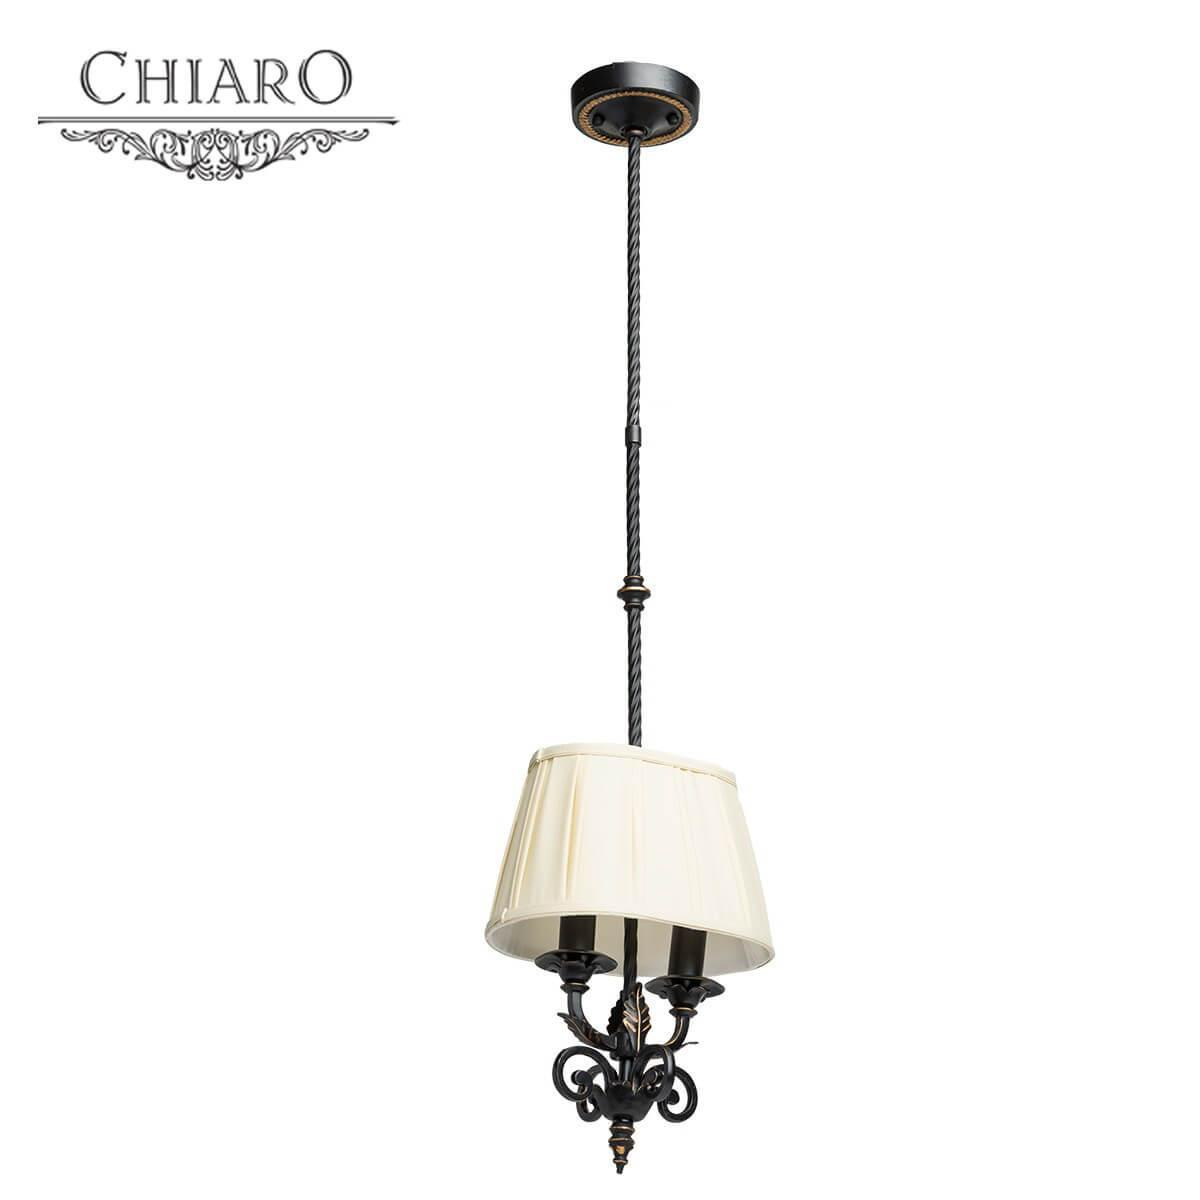 Подвесной светильник Chiaro 401010402, E14, 60 Вт